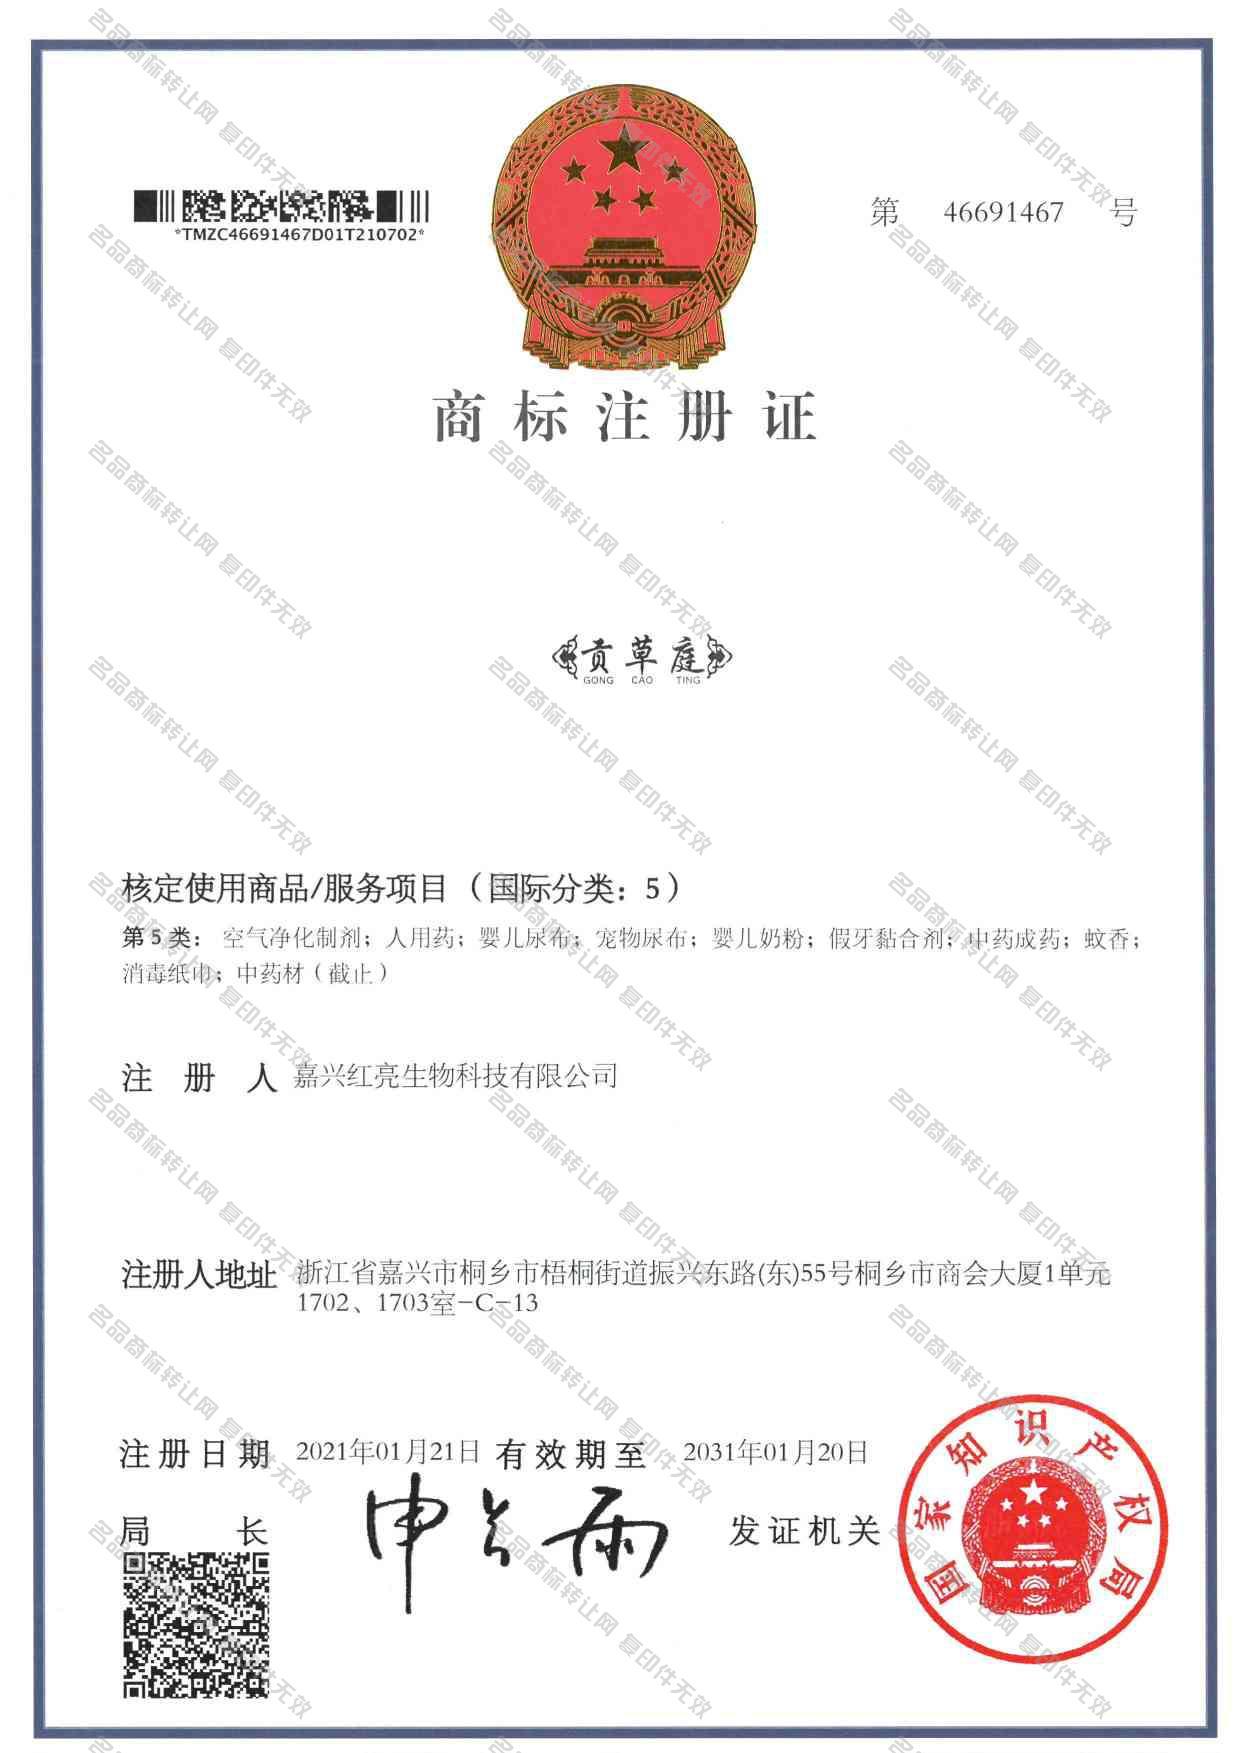 贡草庭;GONGCAOTING注册证